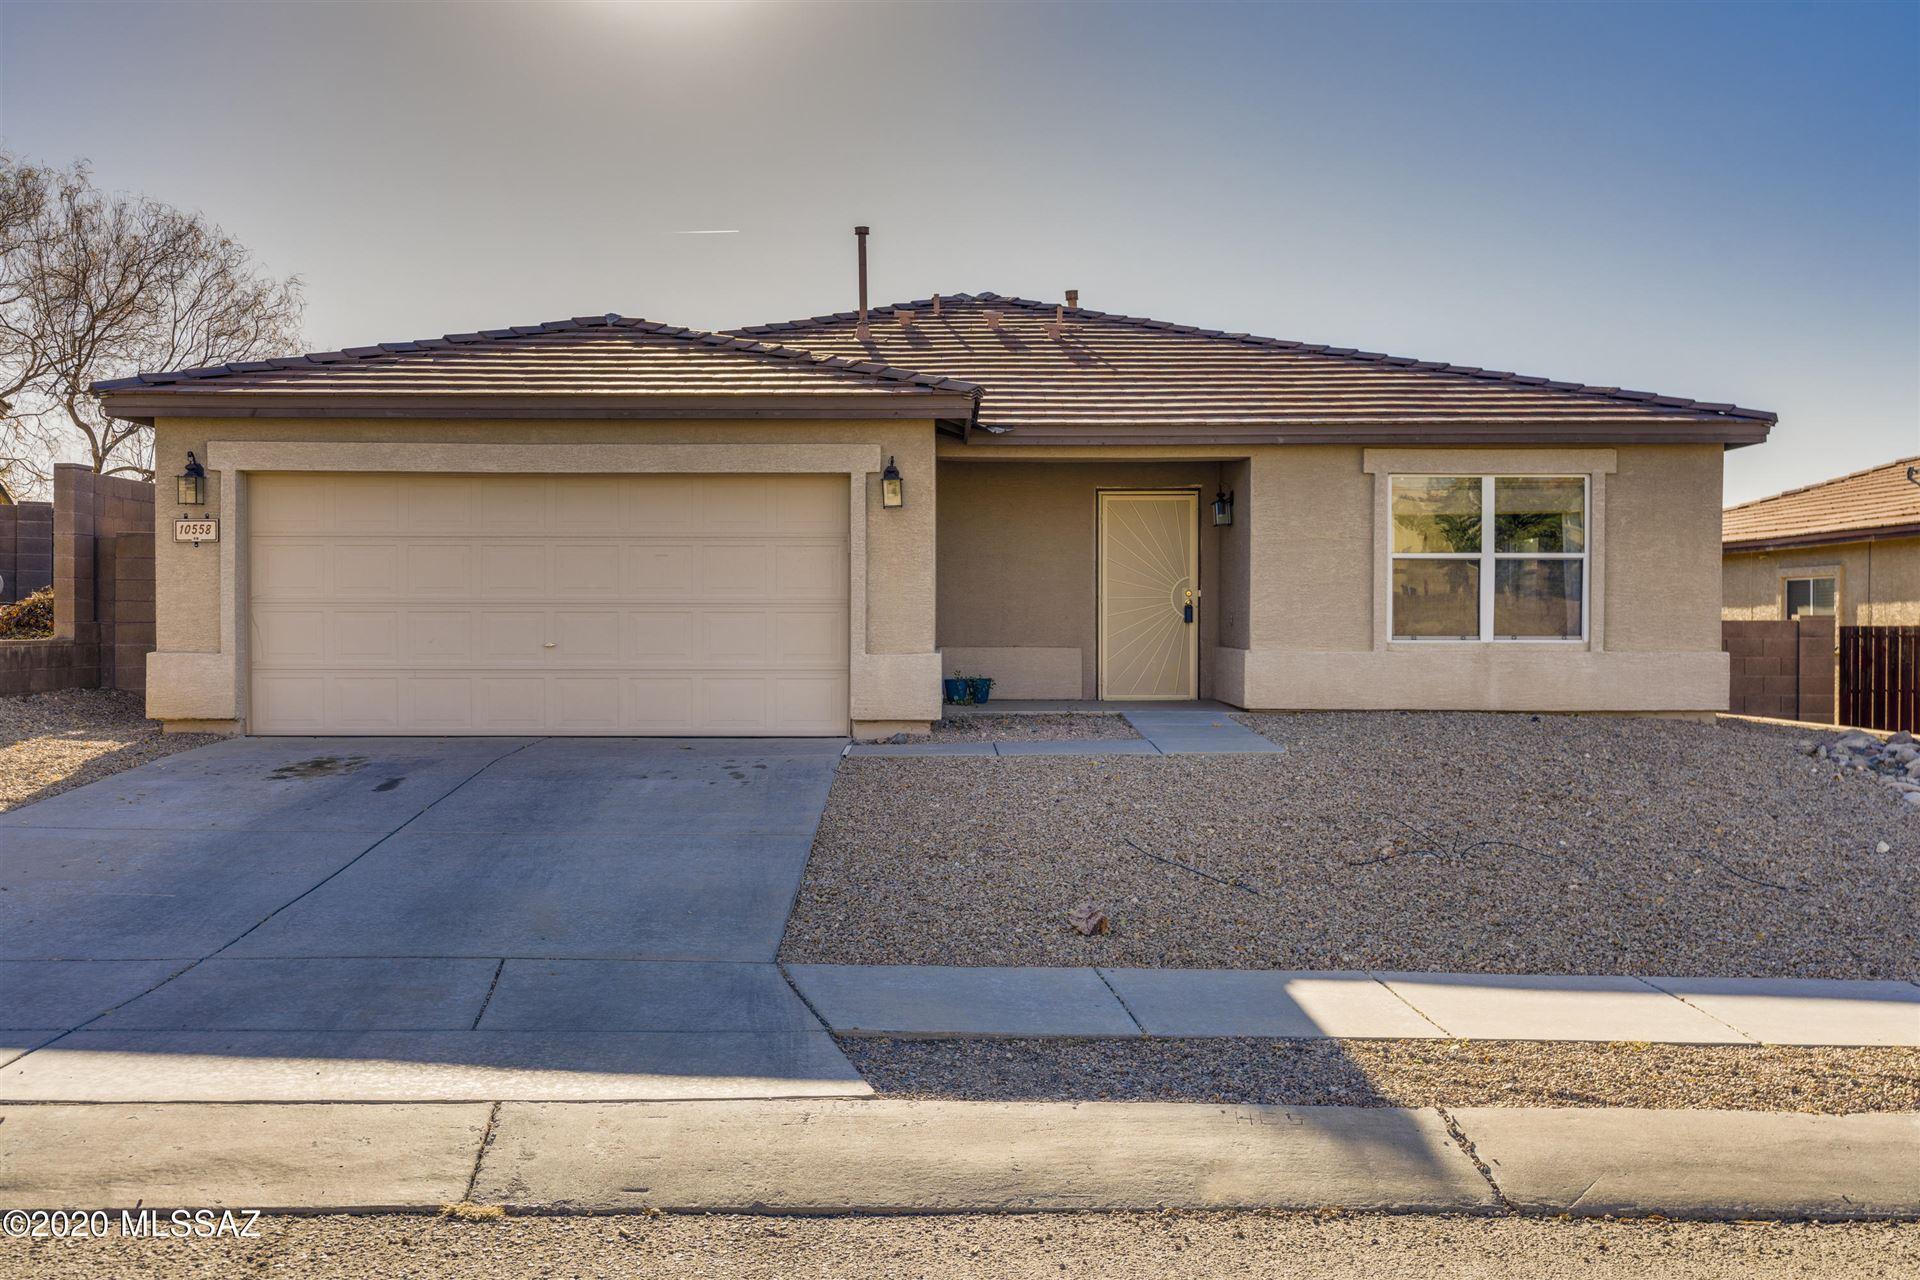 10558 S Sunshower Way, Vail, AZ 85641 - MLS#: 22031679